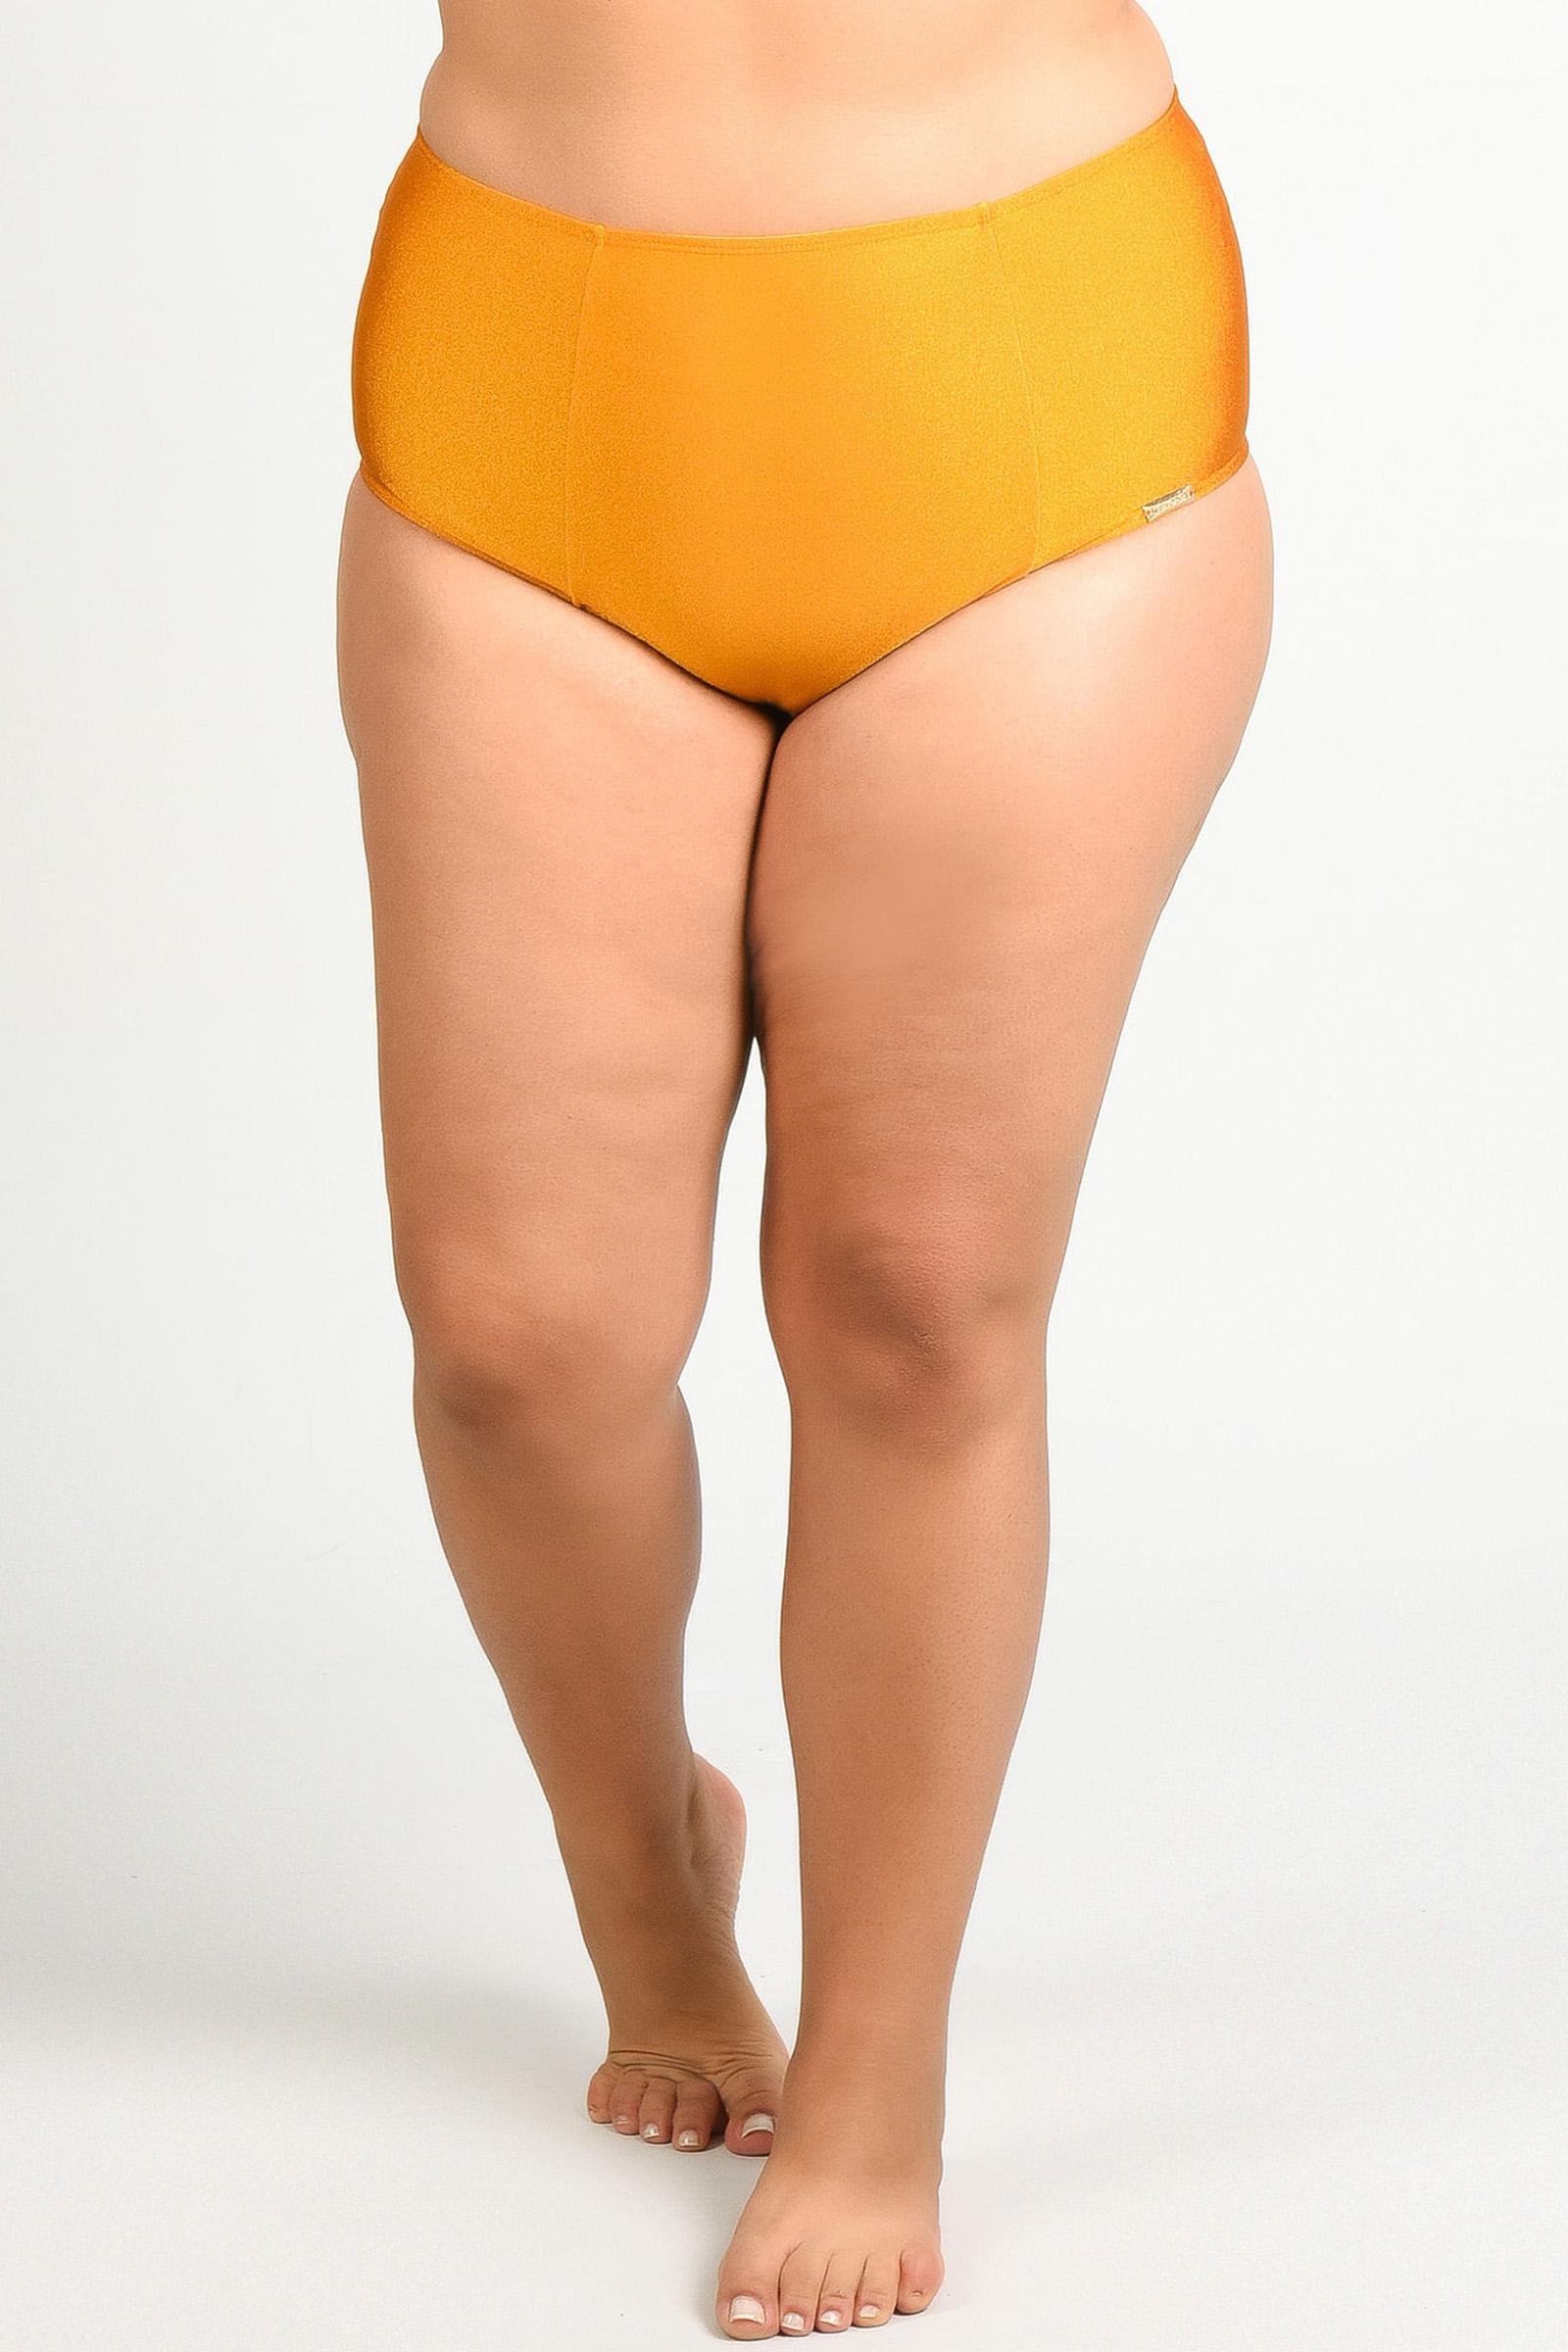 Calcinha biquíni lisa  alta plus size laranja